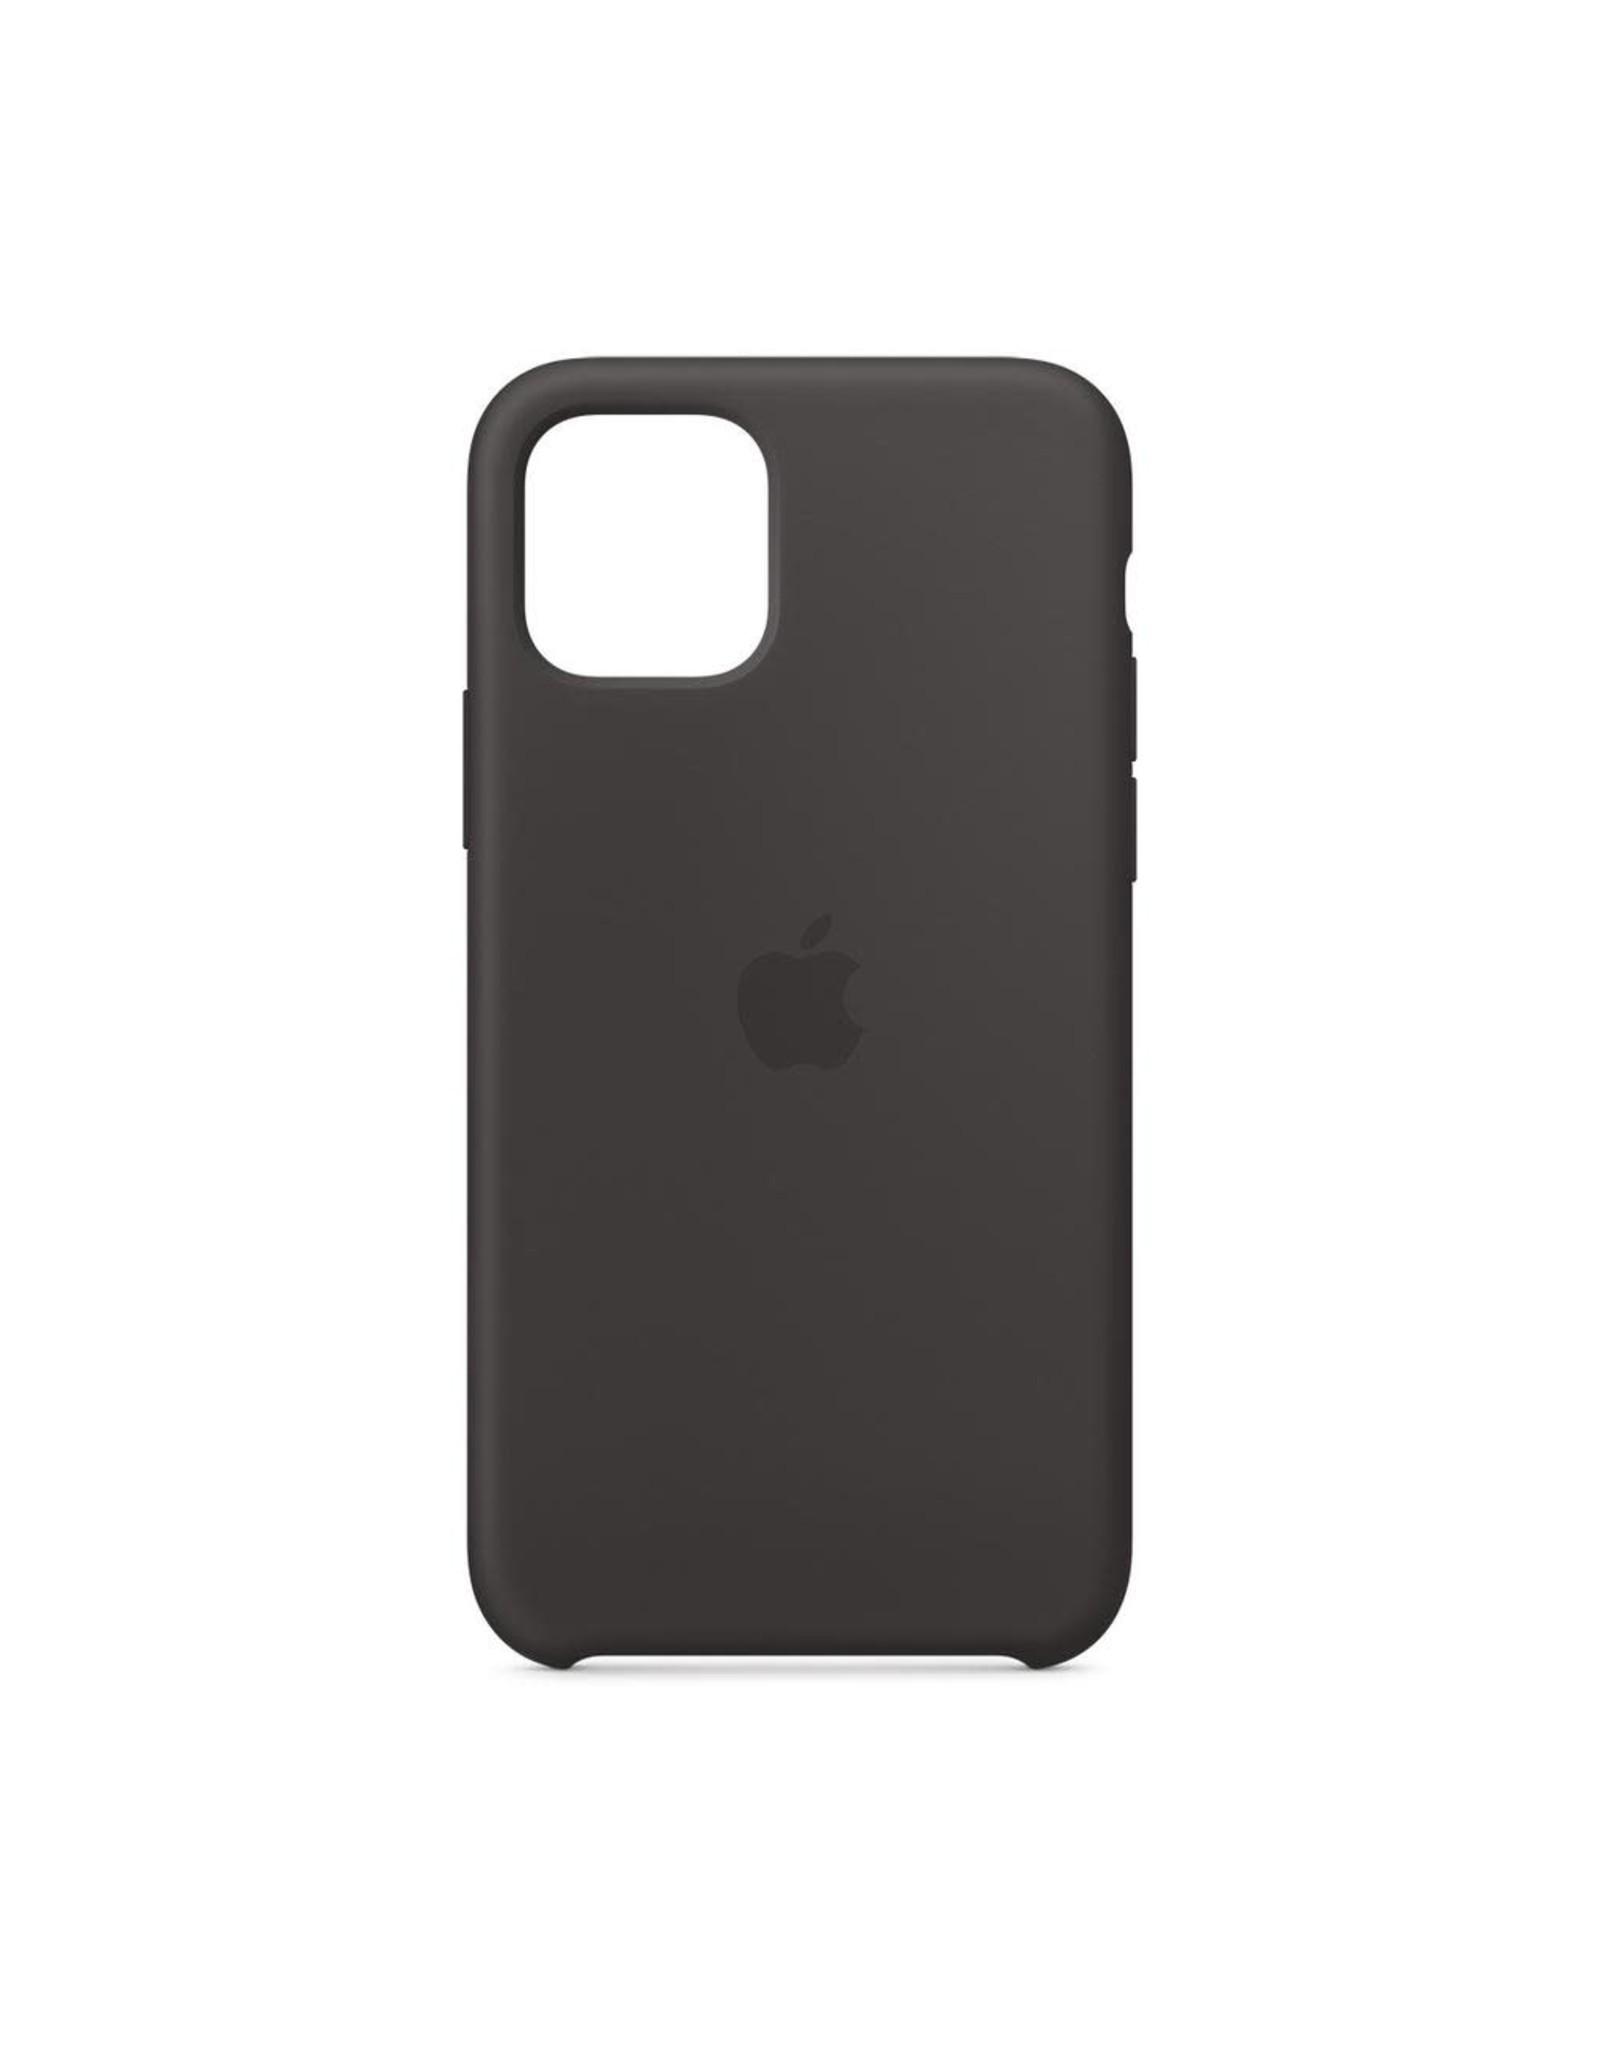 Apple Apple iPhone 11 Pro Silicone Case - BLACK